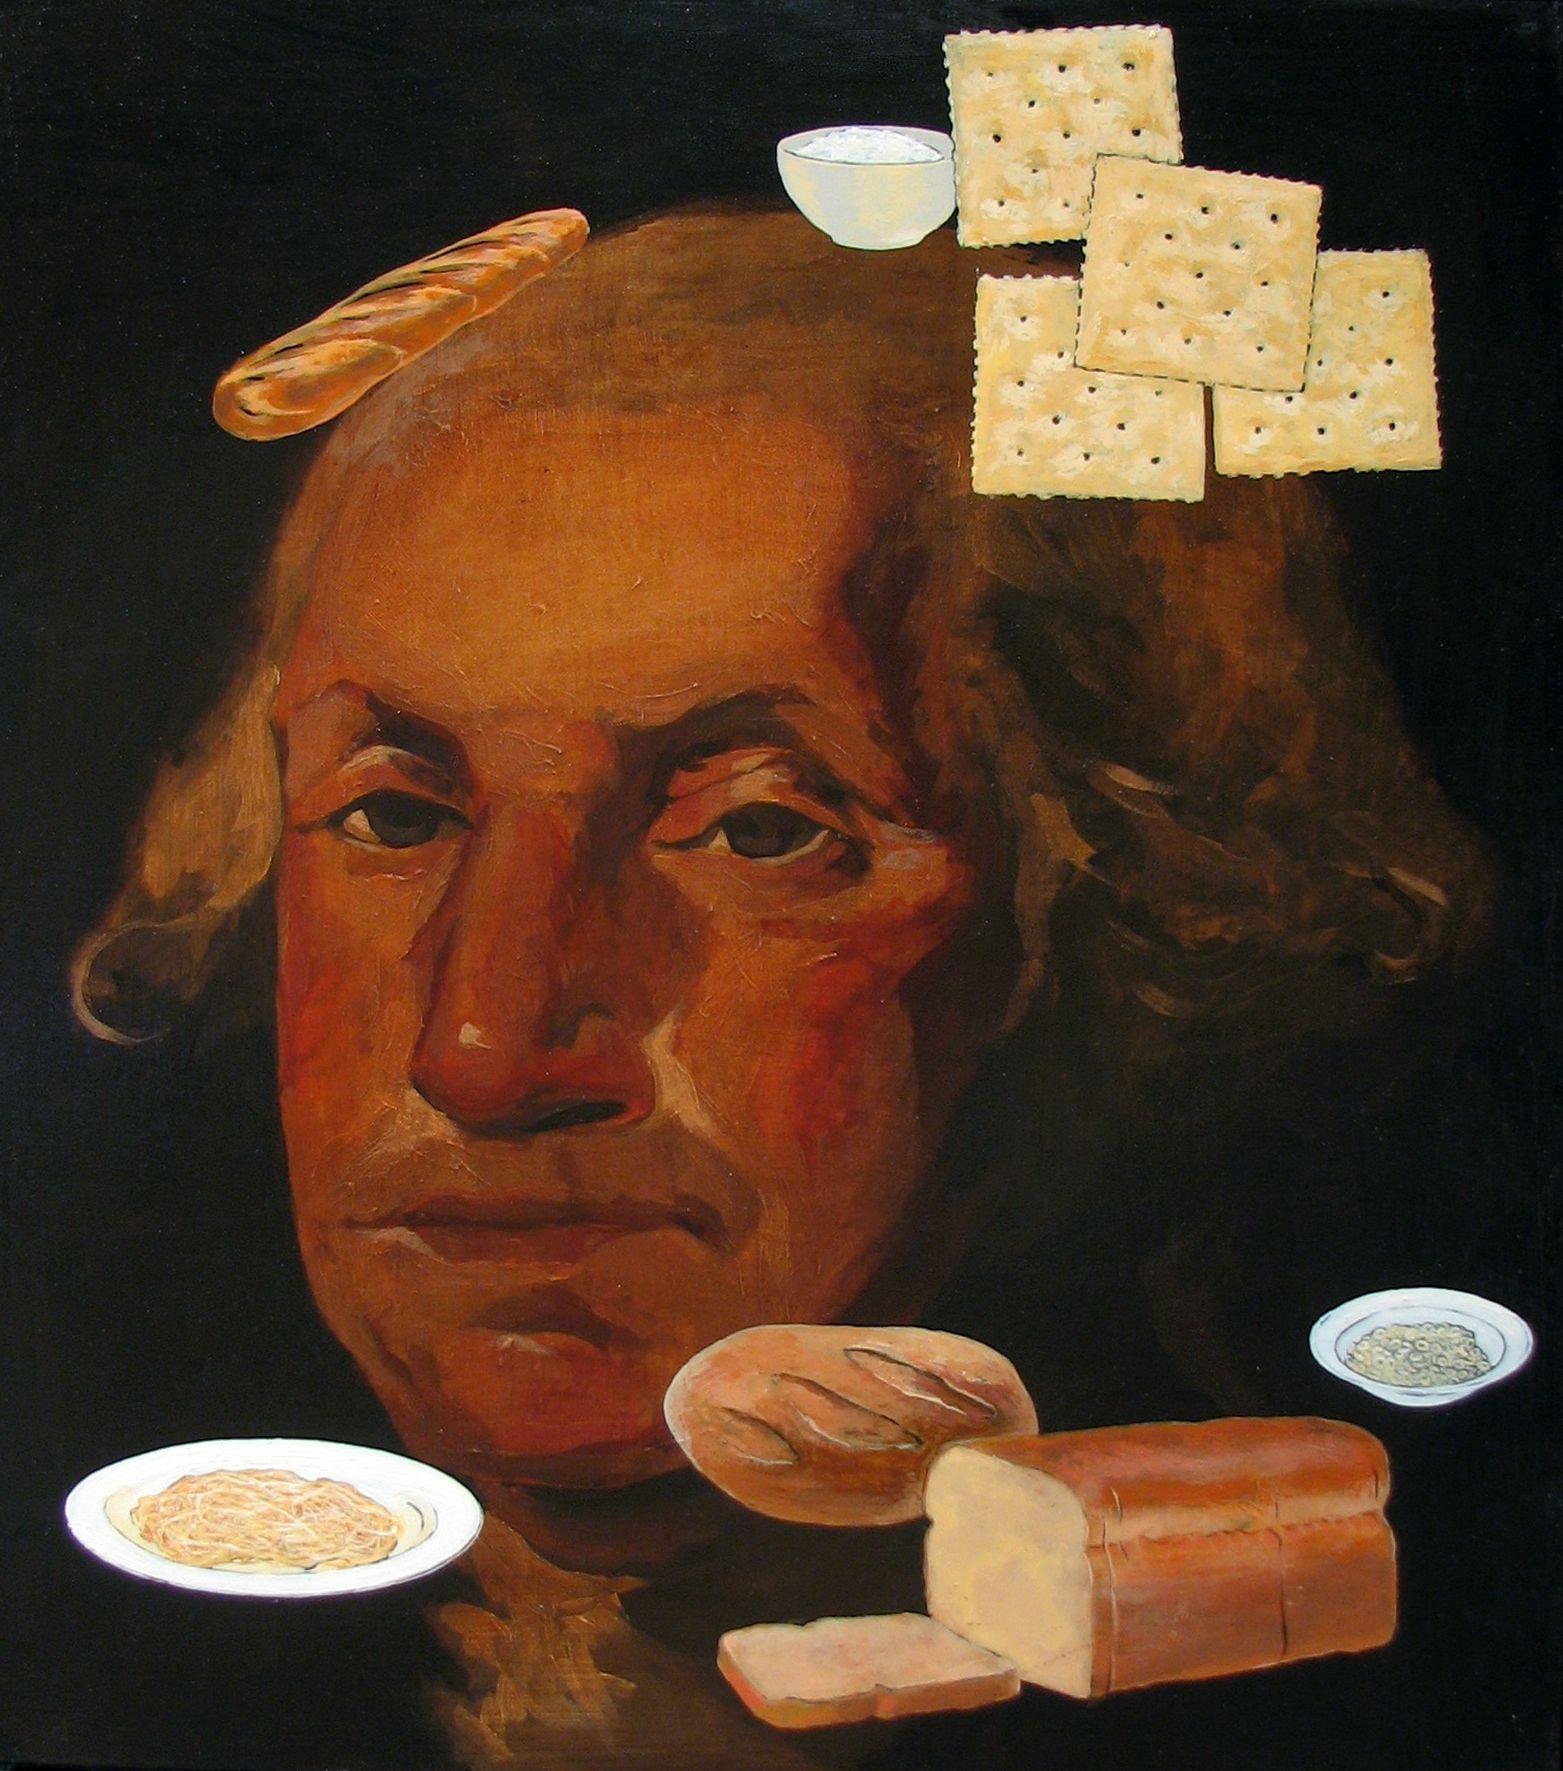 ADAM MYSOCK Washington's Bread, Cereal, Rice, and Pasta, 2009